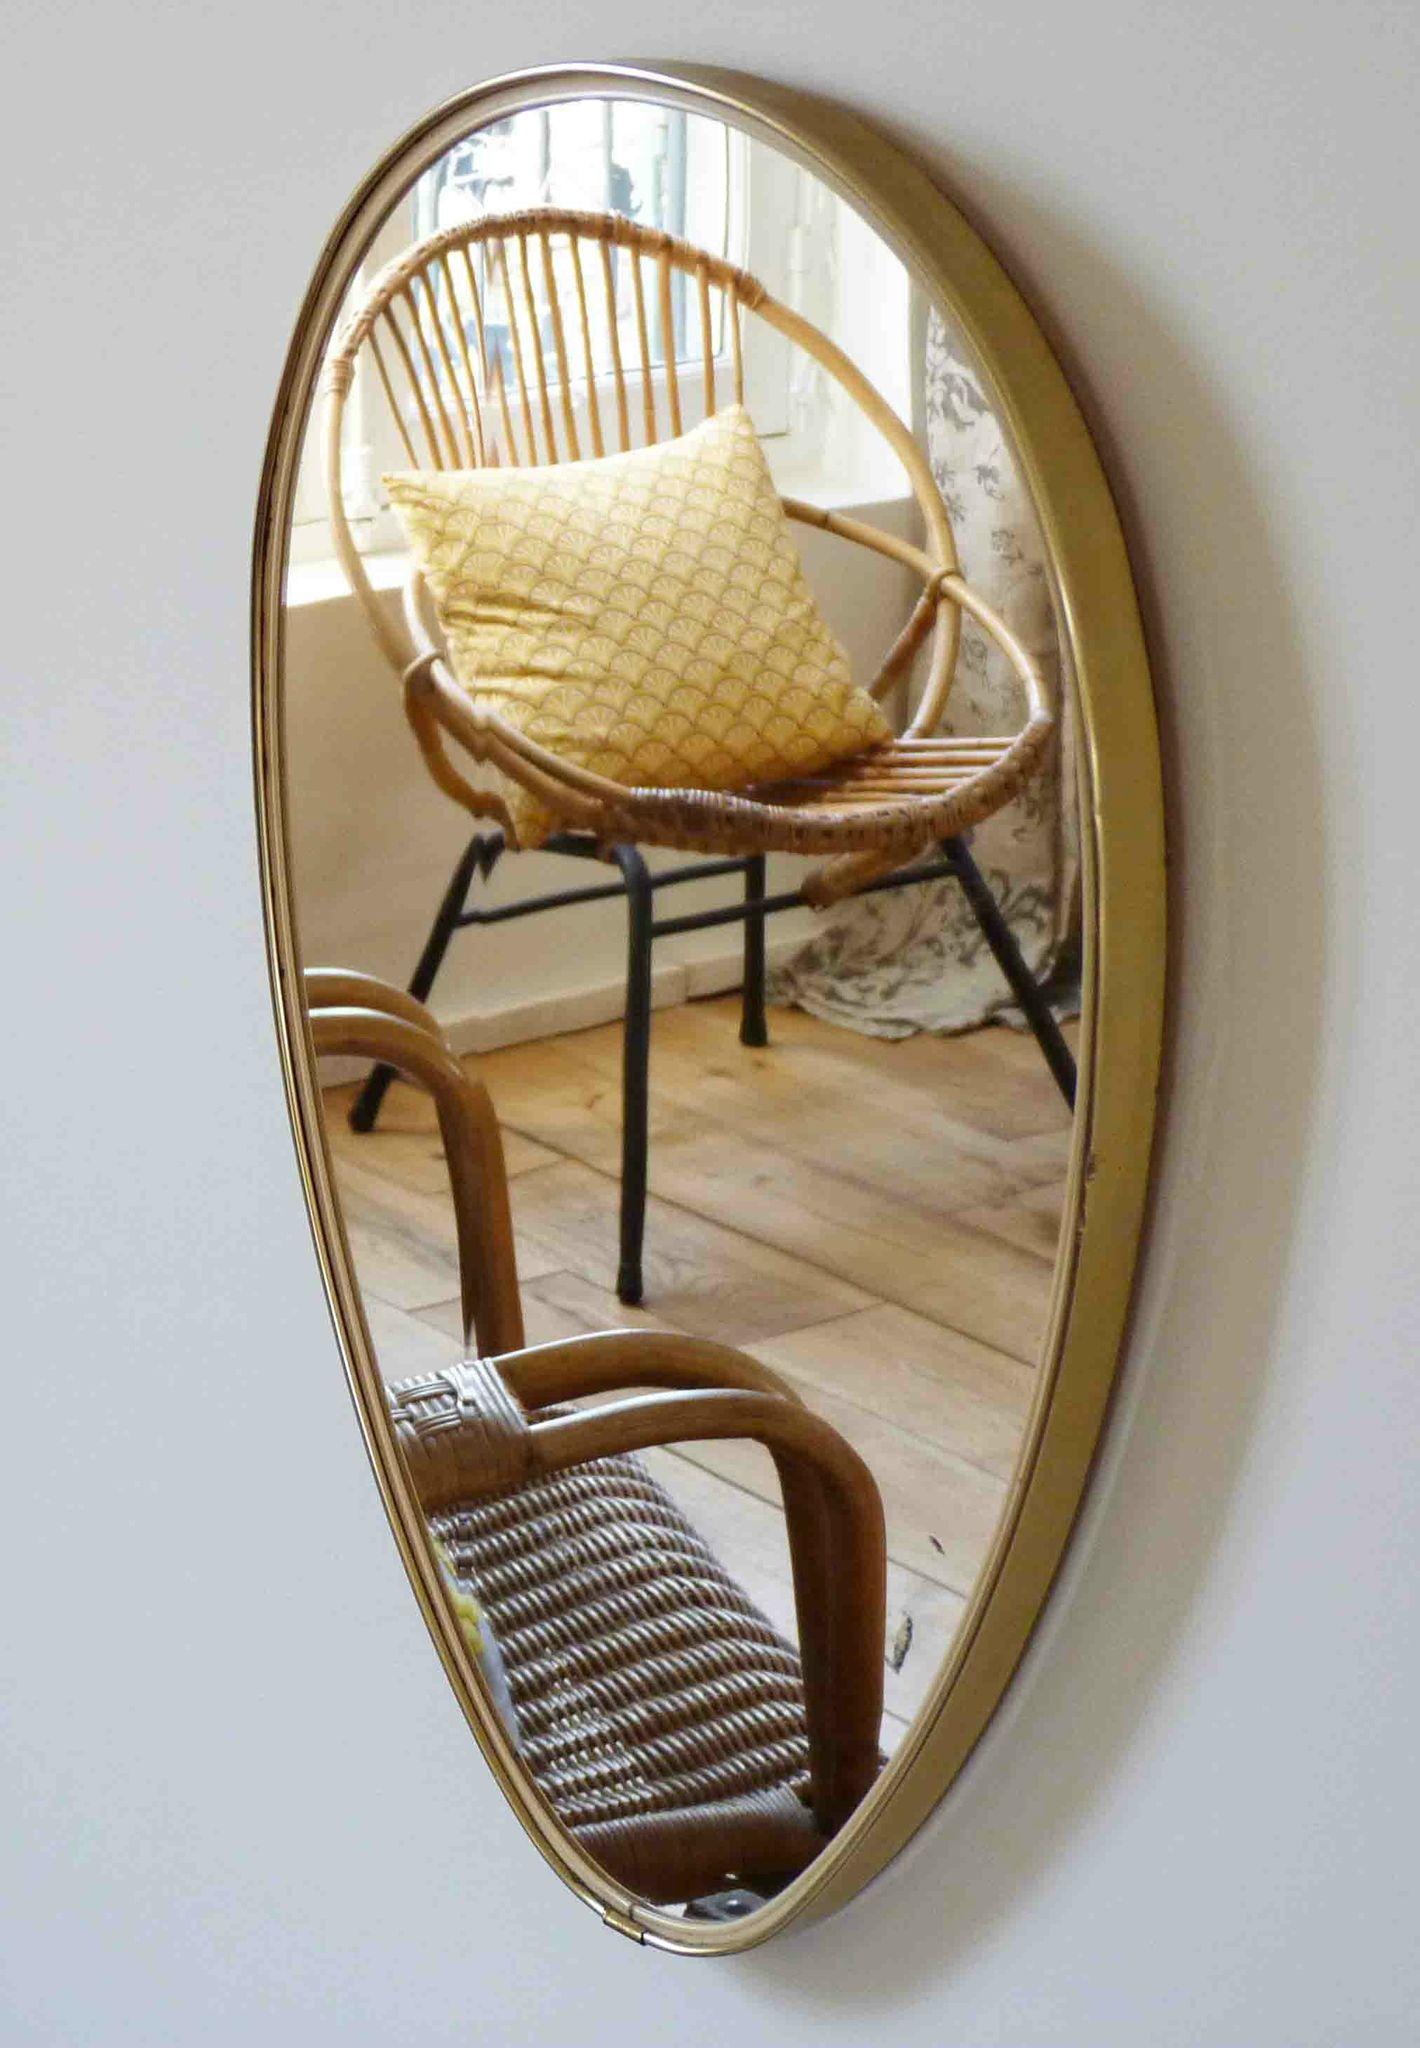 Miroir Année 50 miroir oh mon beau miroir ! - charlotsometimes